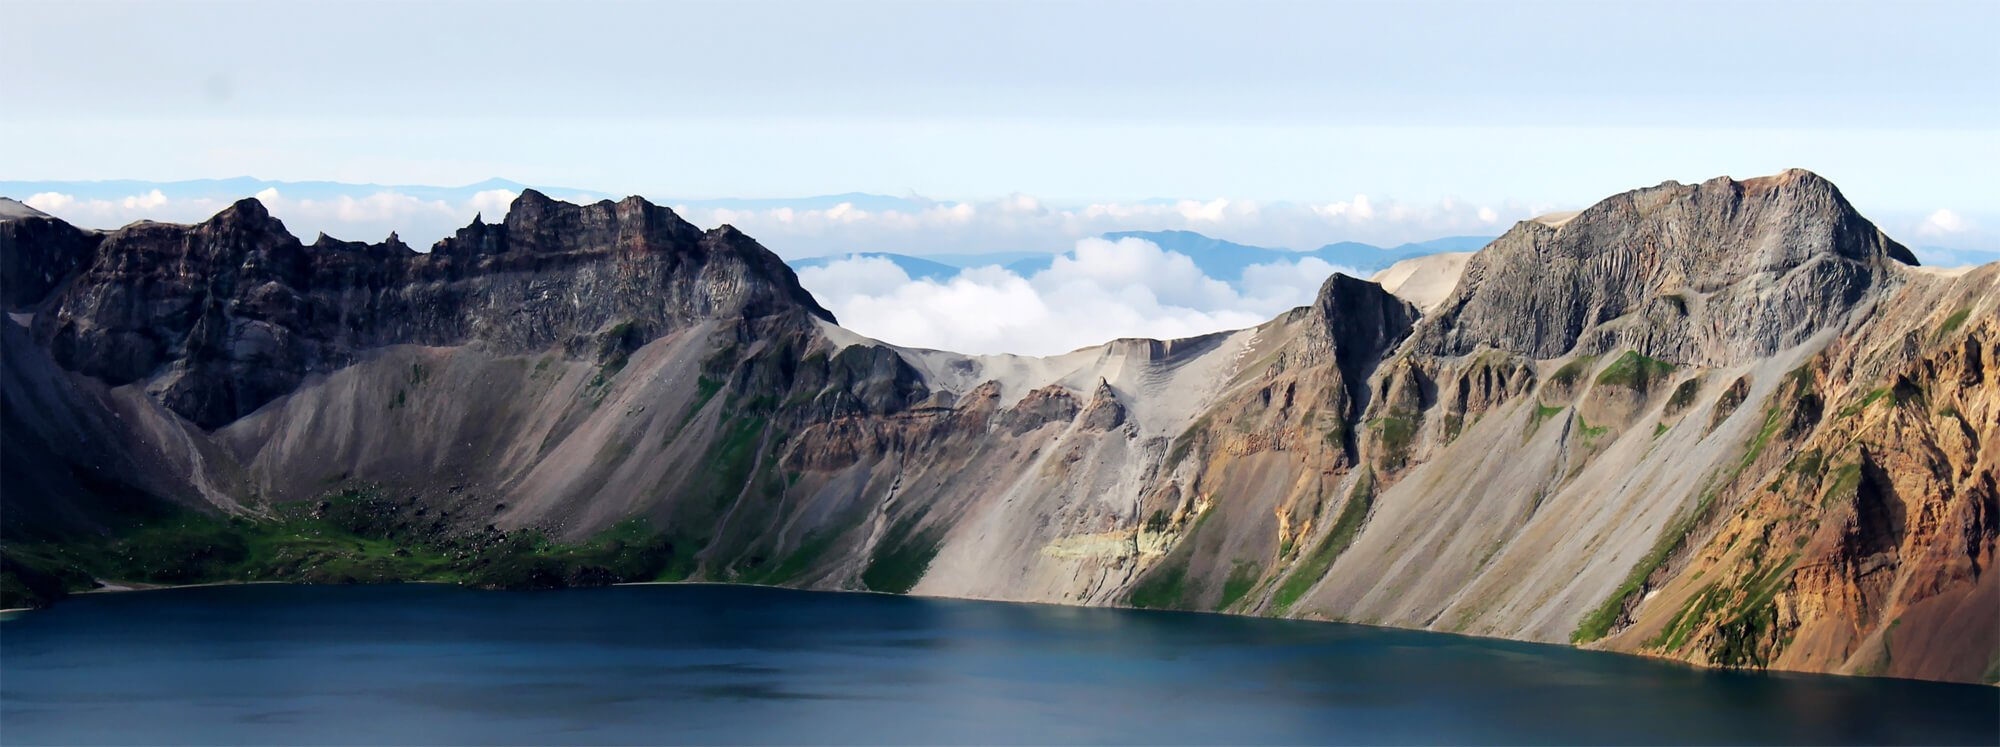 Changbai Mountain in China